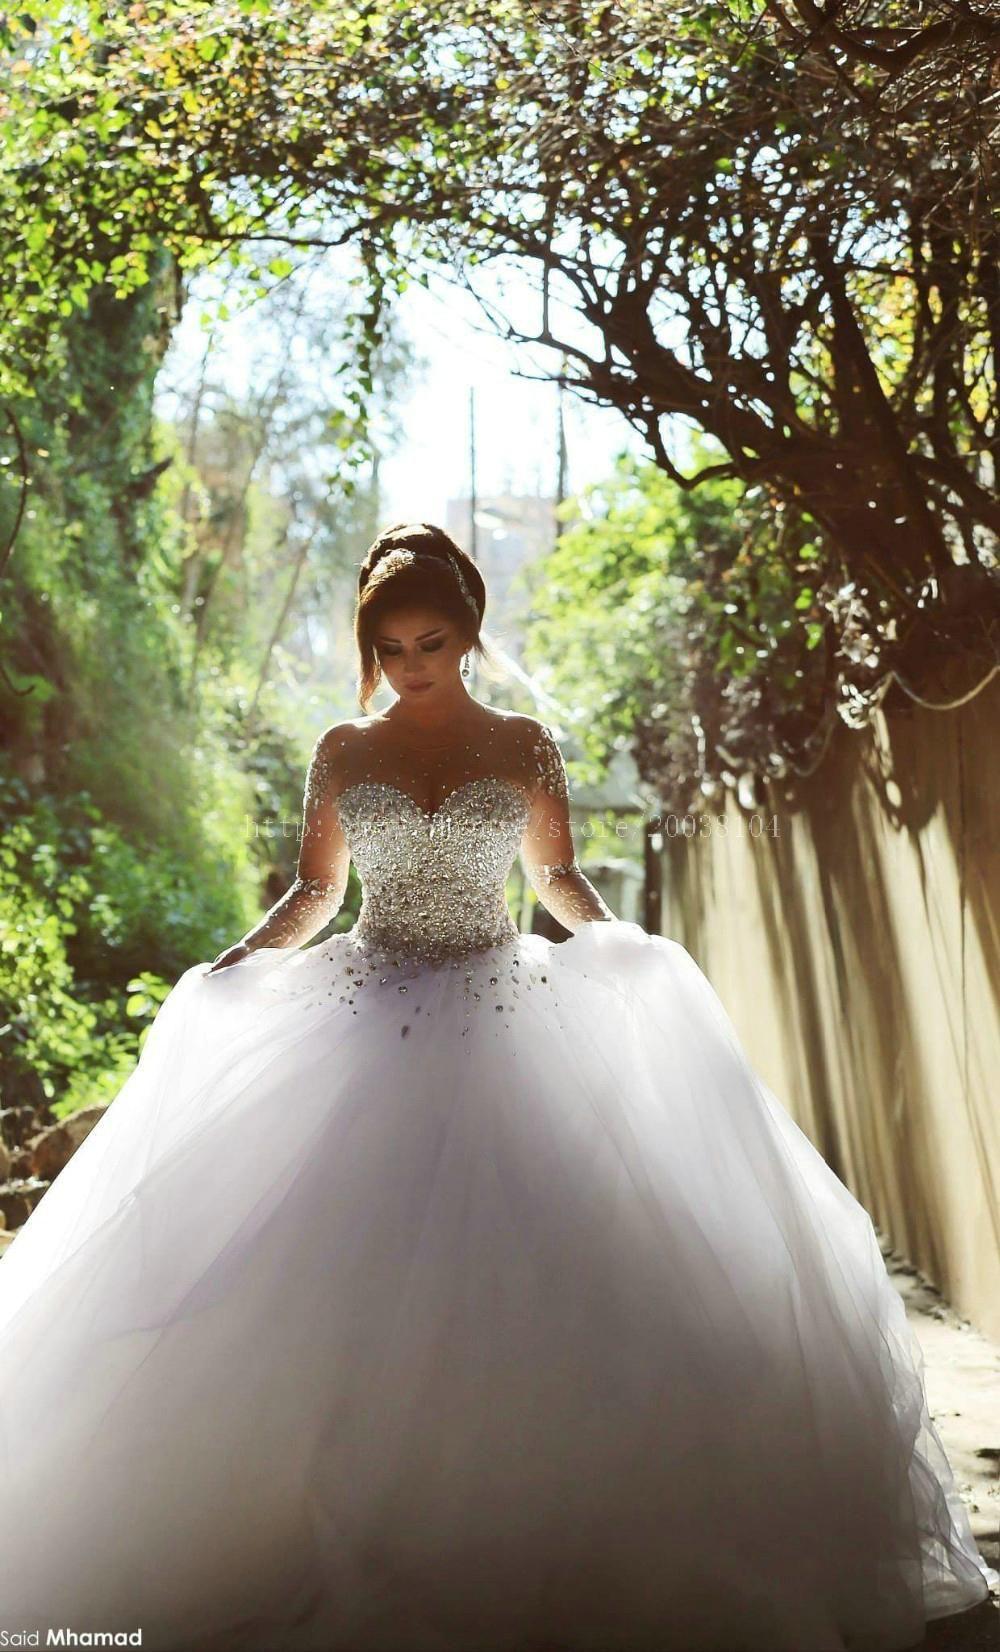 Elegant ball gown wedding dresses long sleeve romantic wedding